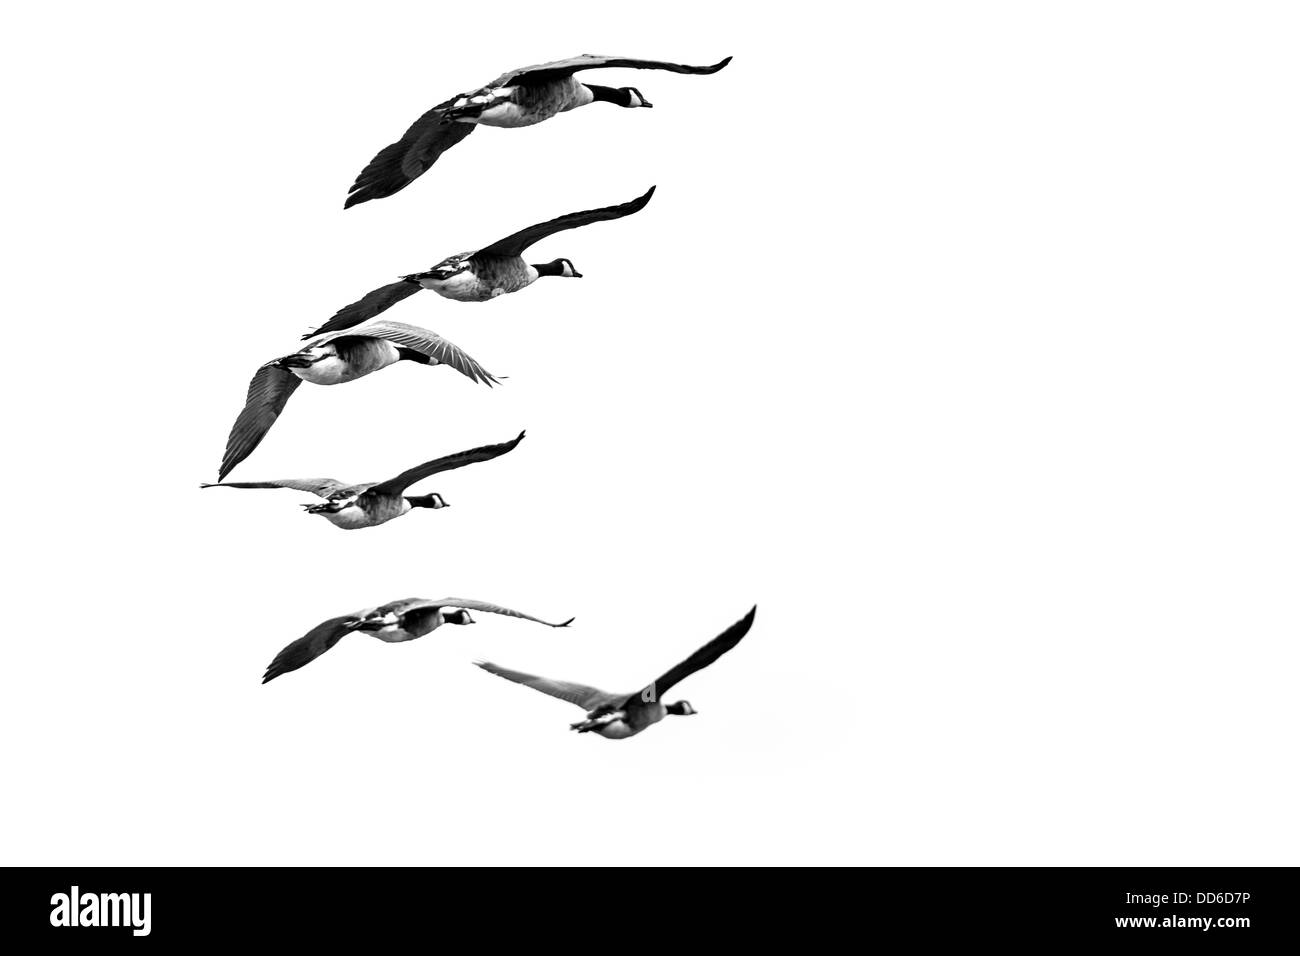 Wild Geese Skein - Stock Image